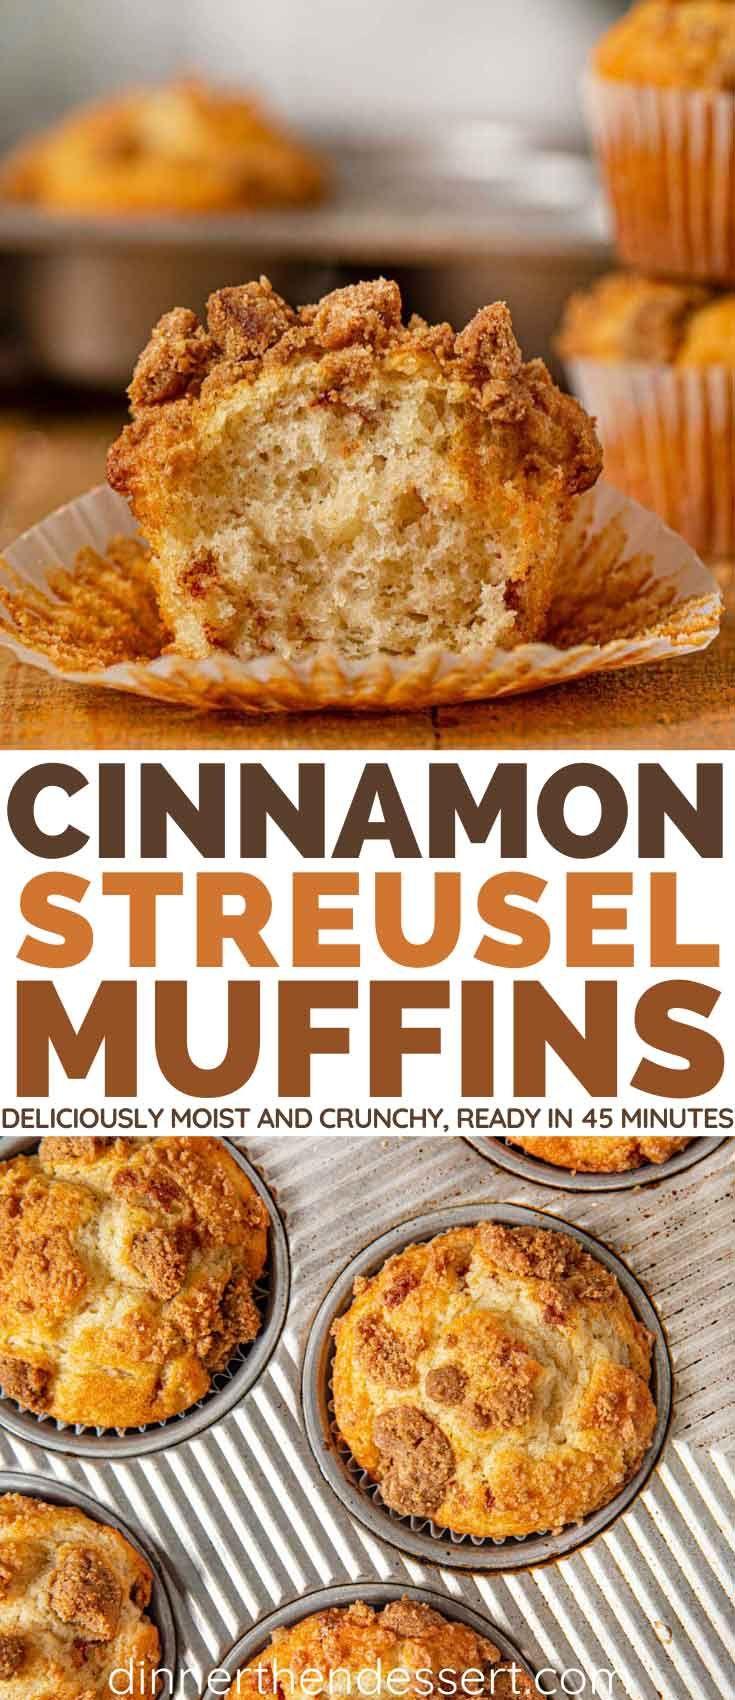 Cinnamon Streusel Muffin Recipe (Coffee Cake) - Dinner, then Dessert